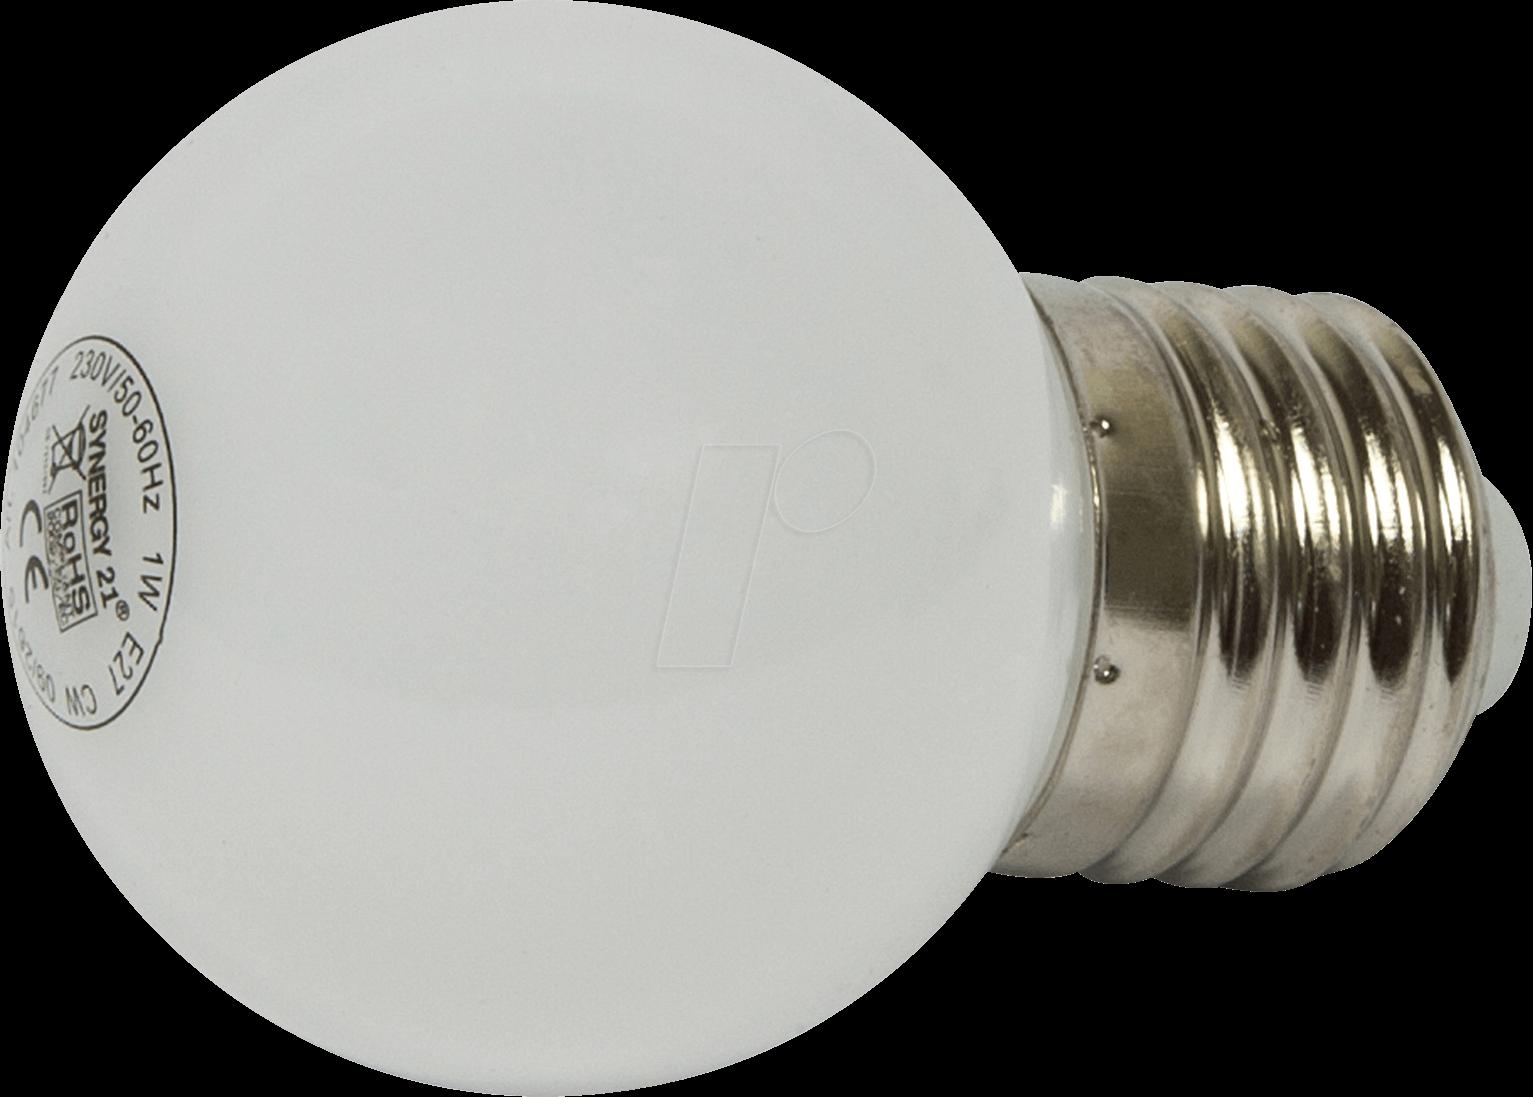 Led Lampen E27 : Syn 124279: led lampe e27 1 w warmweiß bei reichelt elektronik